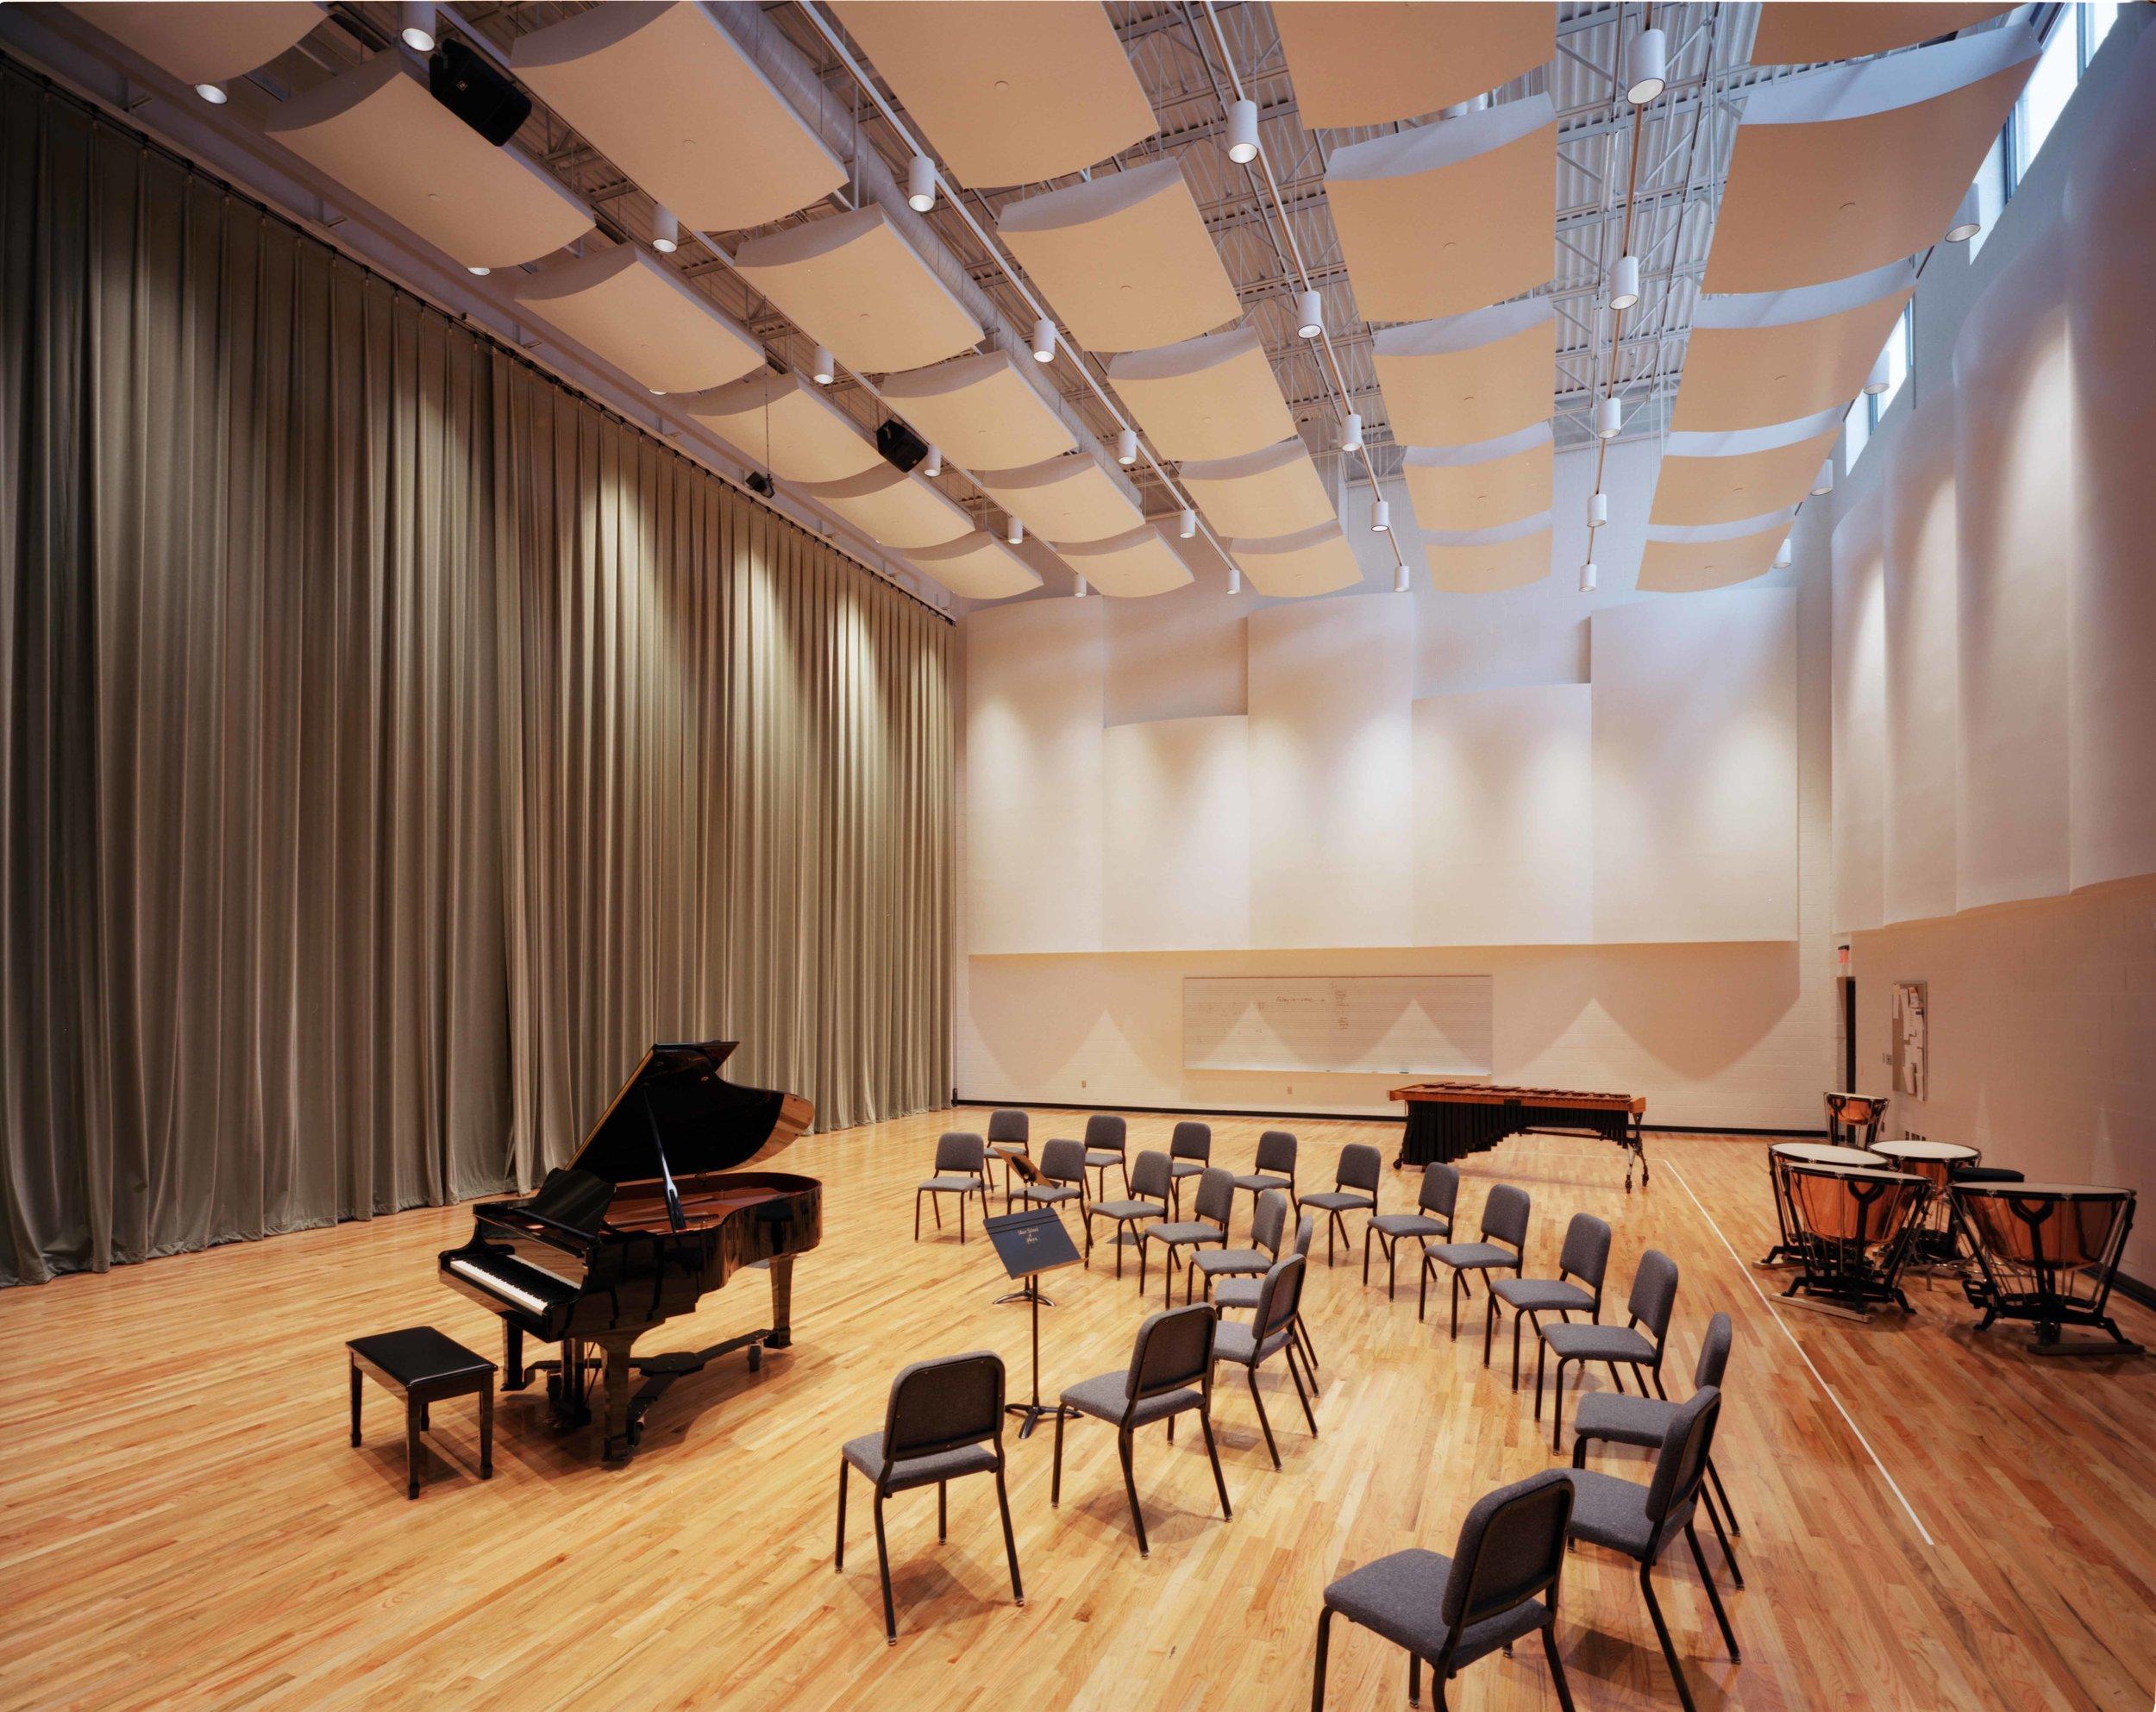 Blair School of Music Orchestra Reheasal Hall